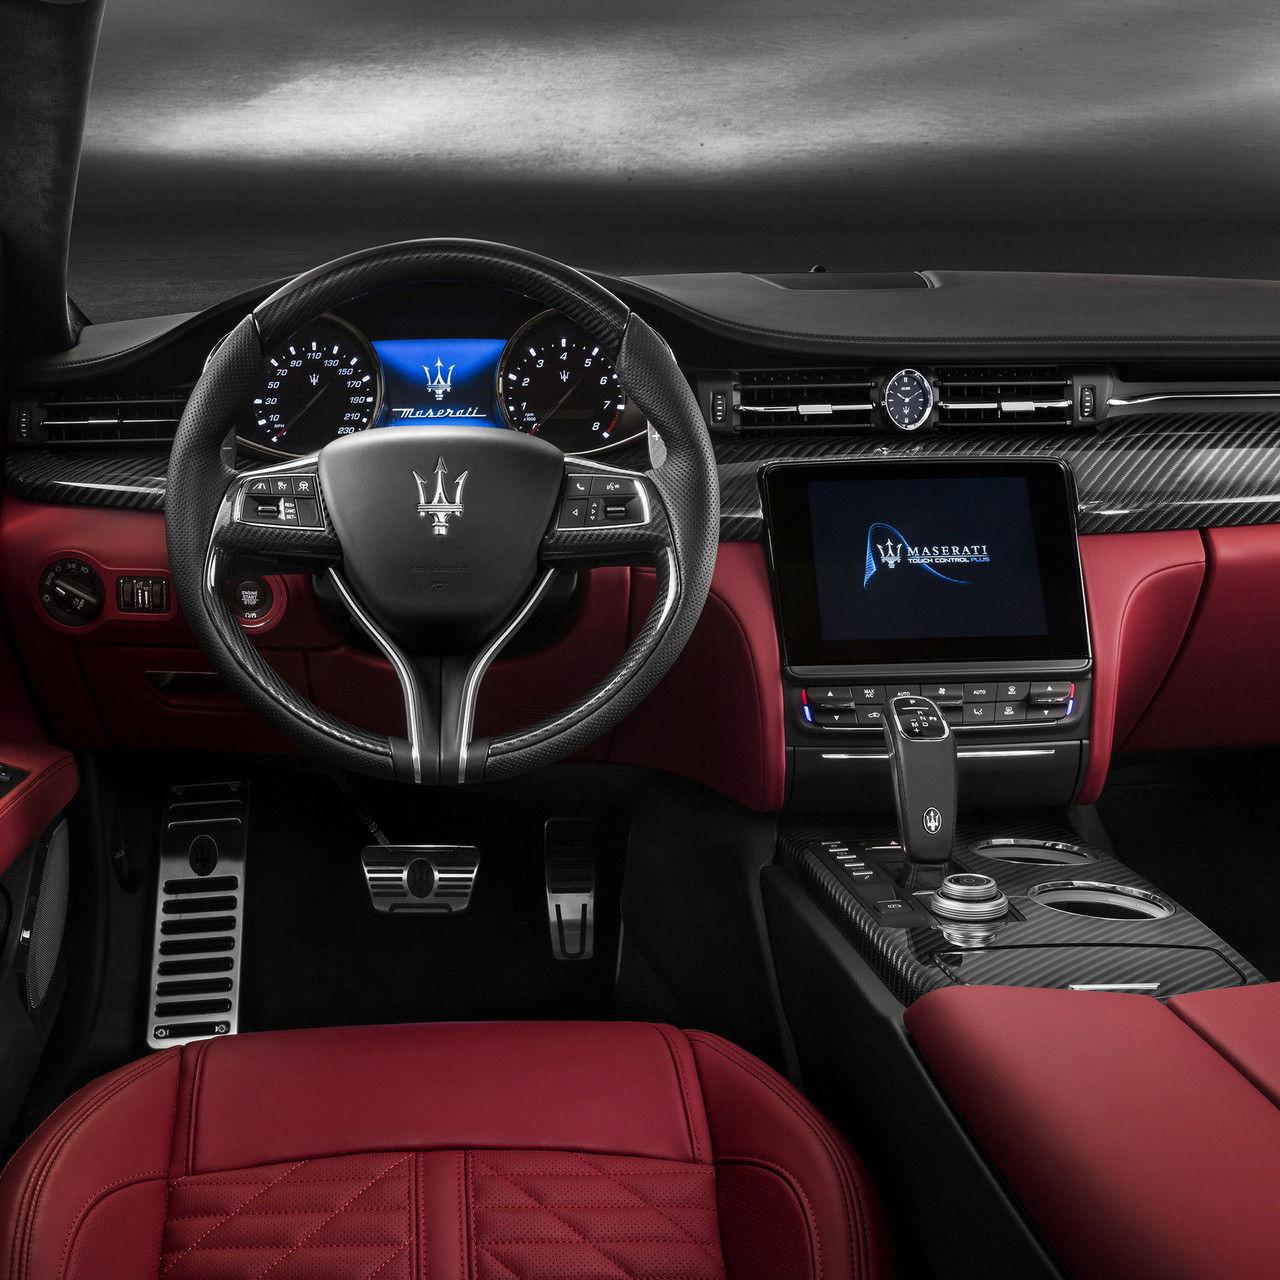 Maserati Quattroporte - Design volant et intérieurs - Rosso